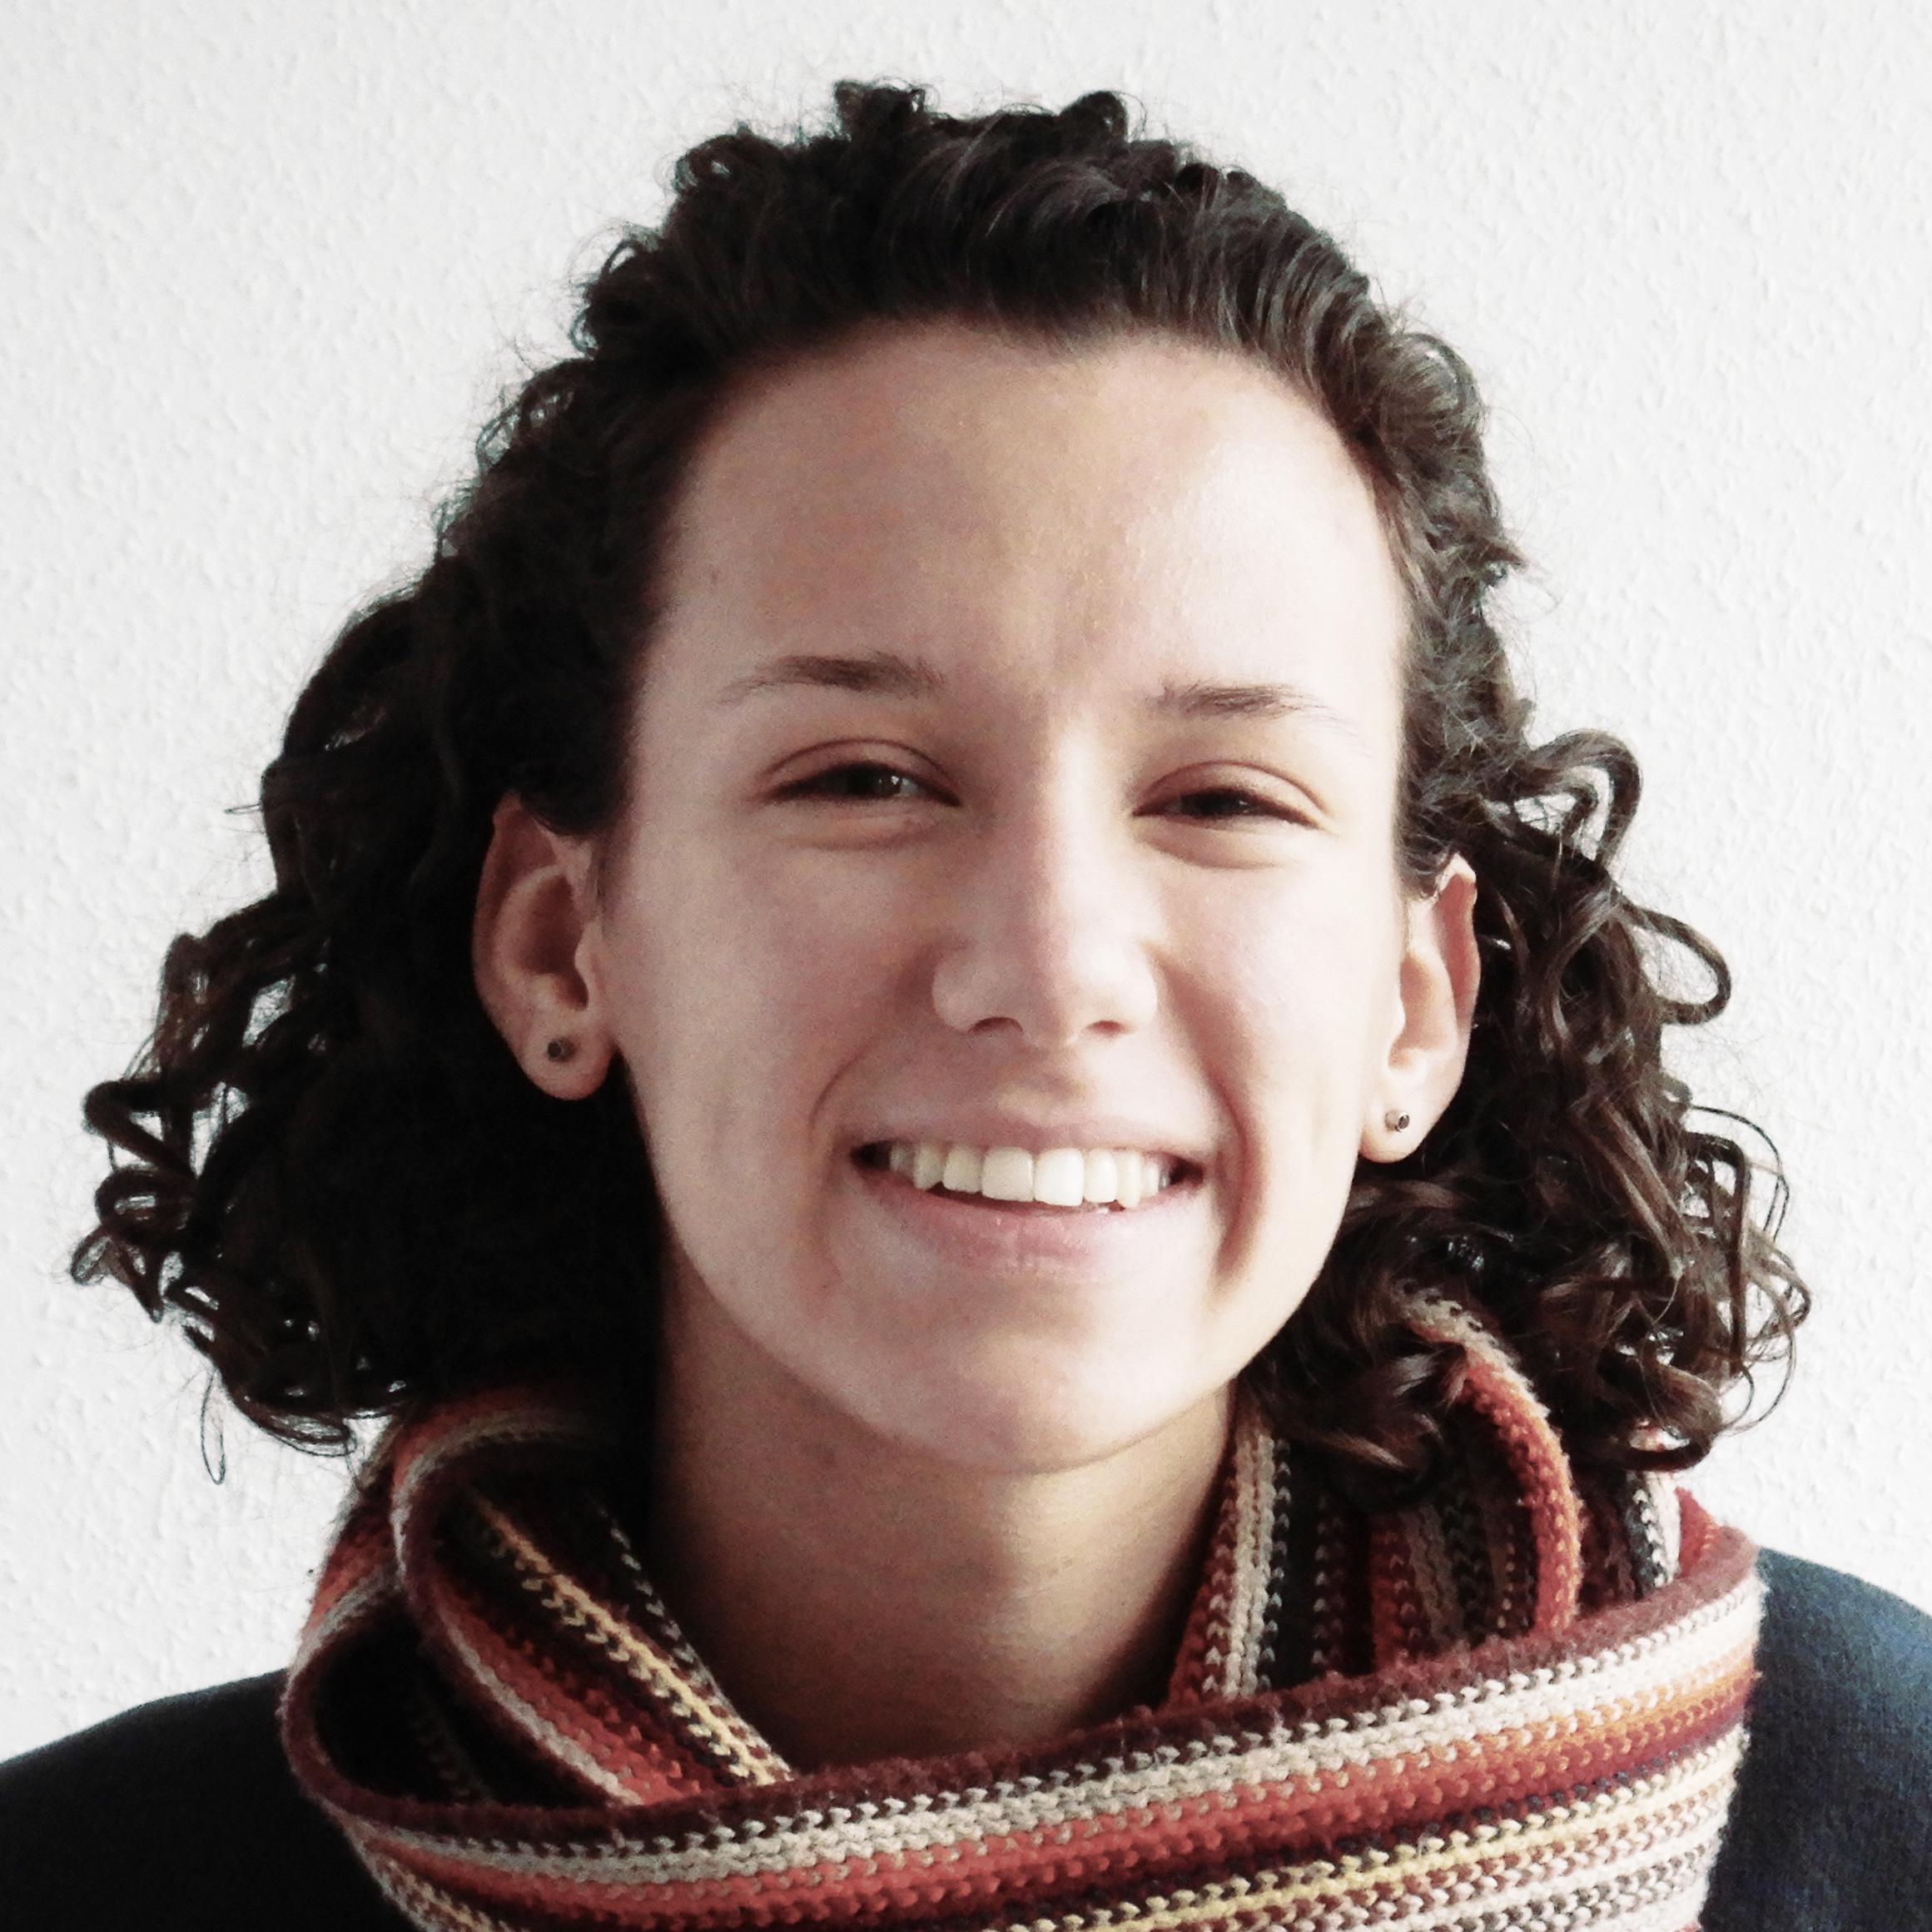 Lisa Gislimberti